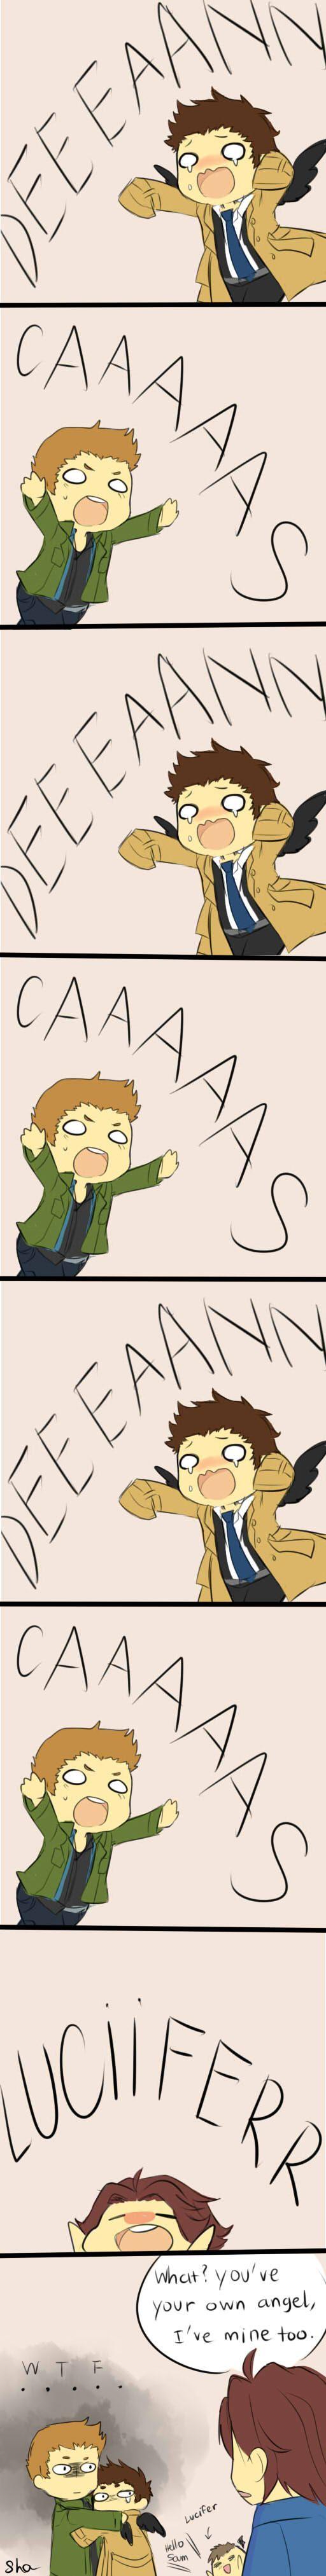 Supernatural- Cas, Dean, Sam, and Lucifer